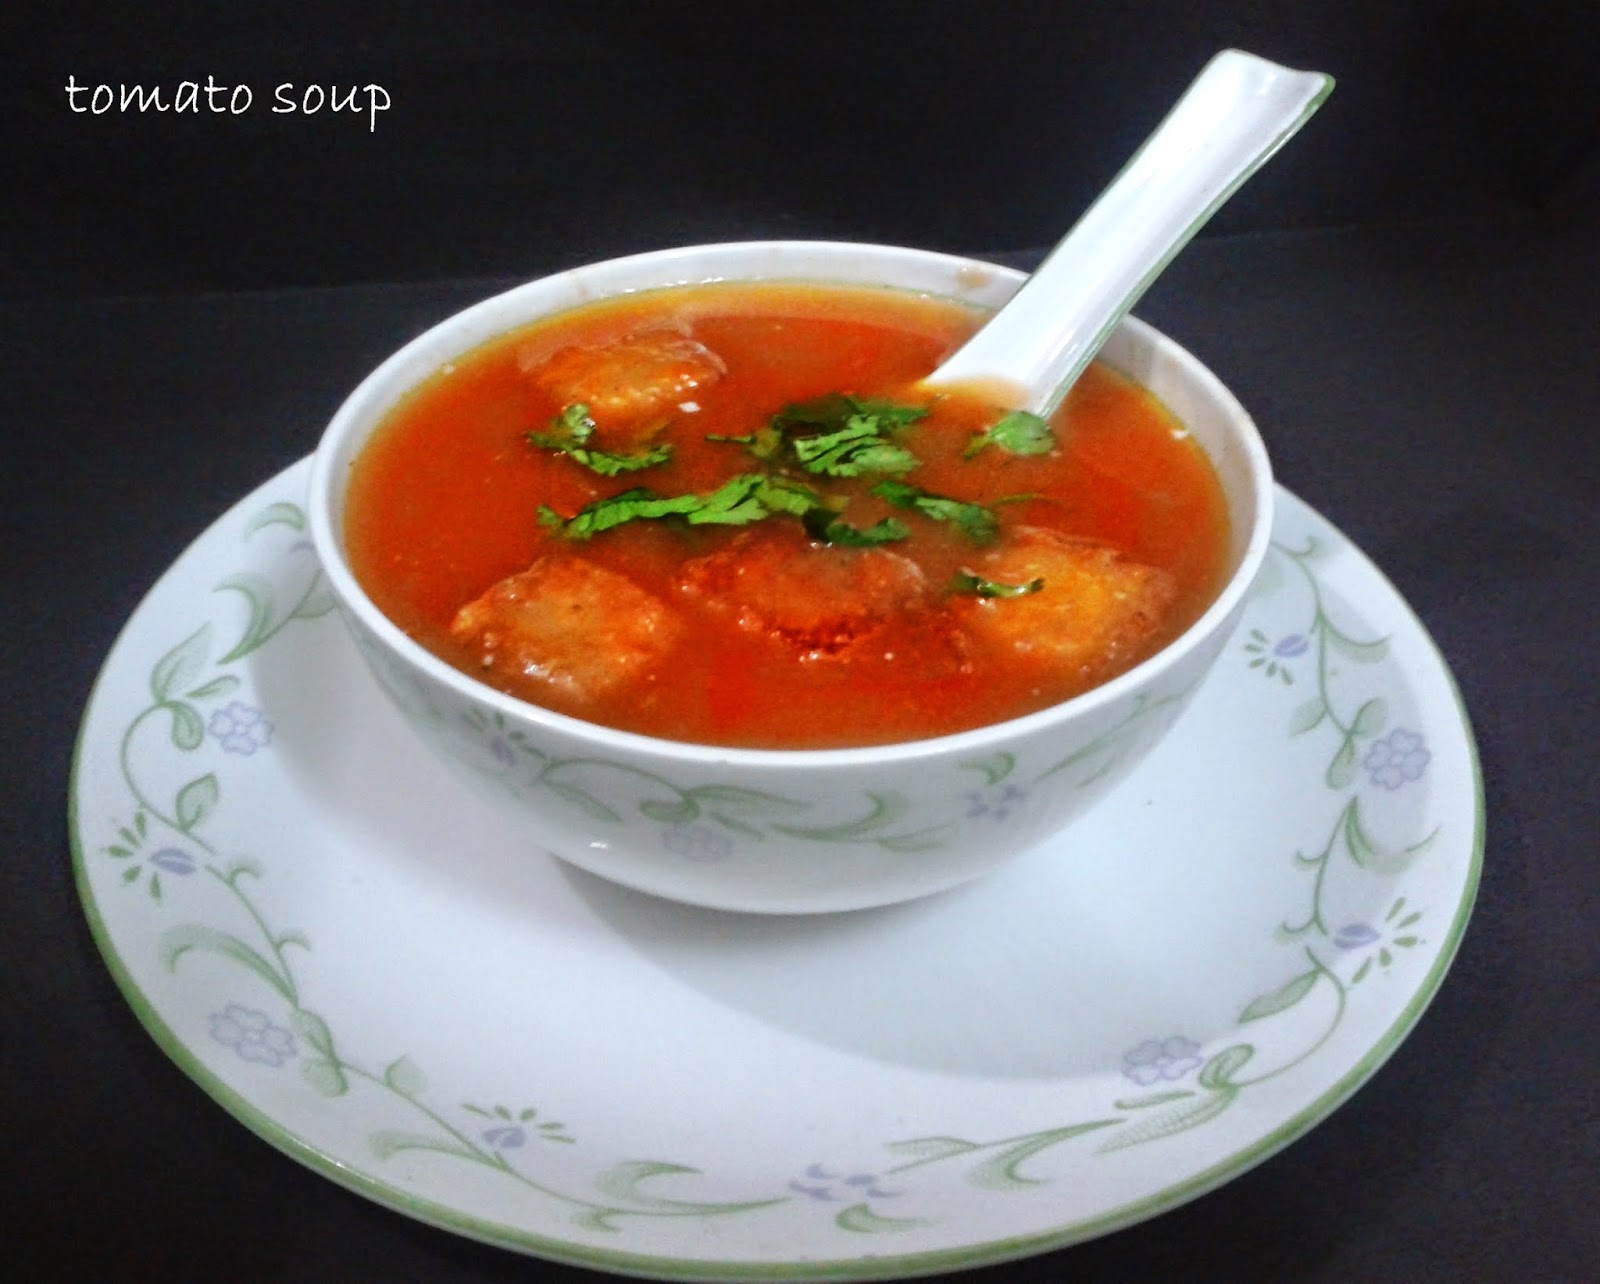 http://www.paakvidhi.com/2013/07/tomato-soup.html